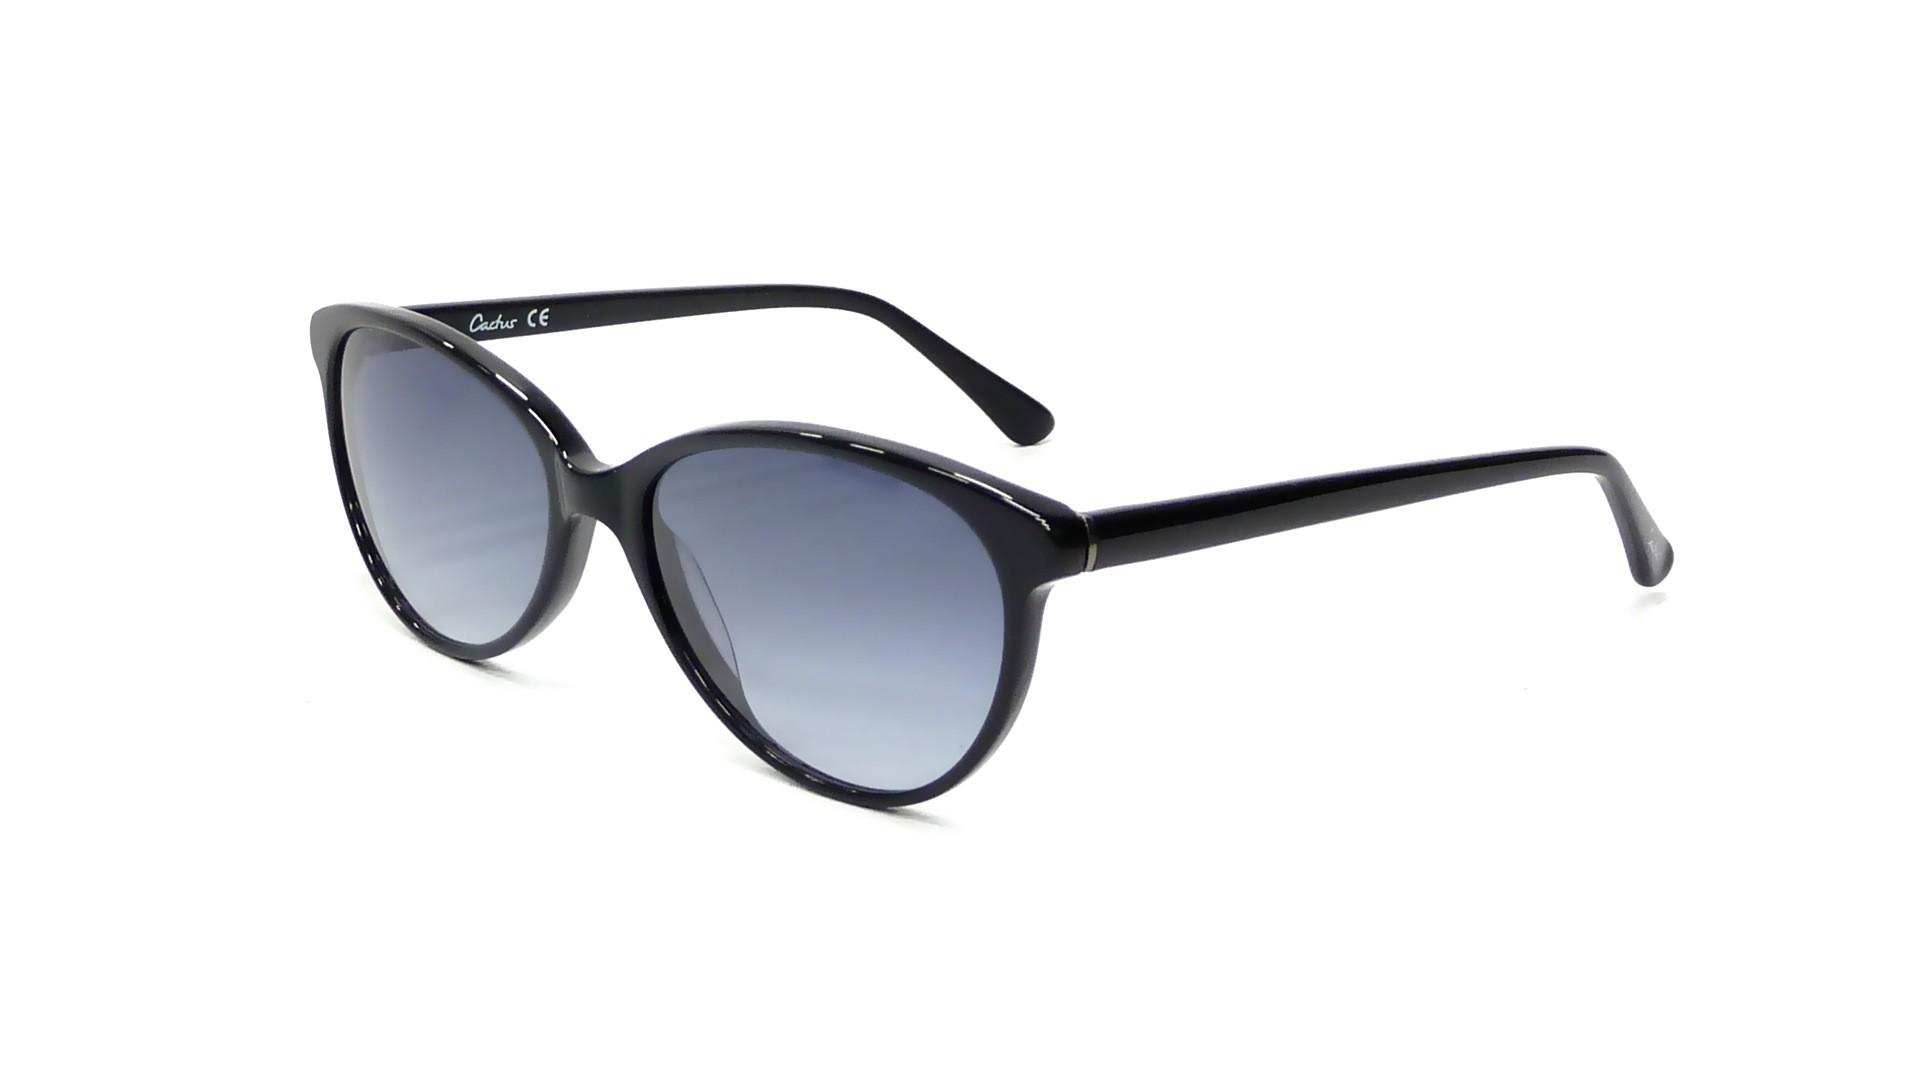 Glasses Frames Recto Or Quiapo : 2 white unifocal lenses